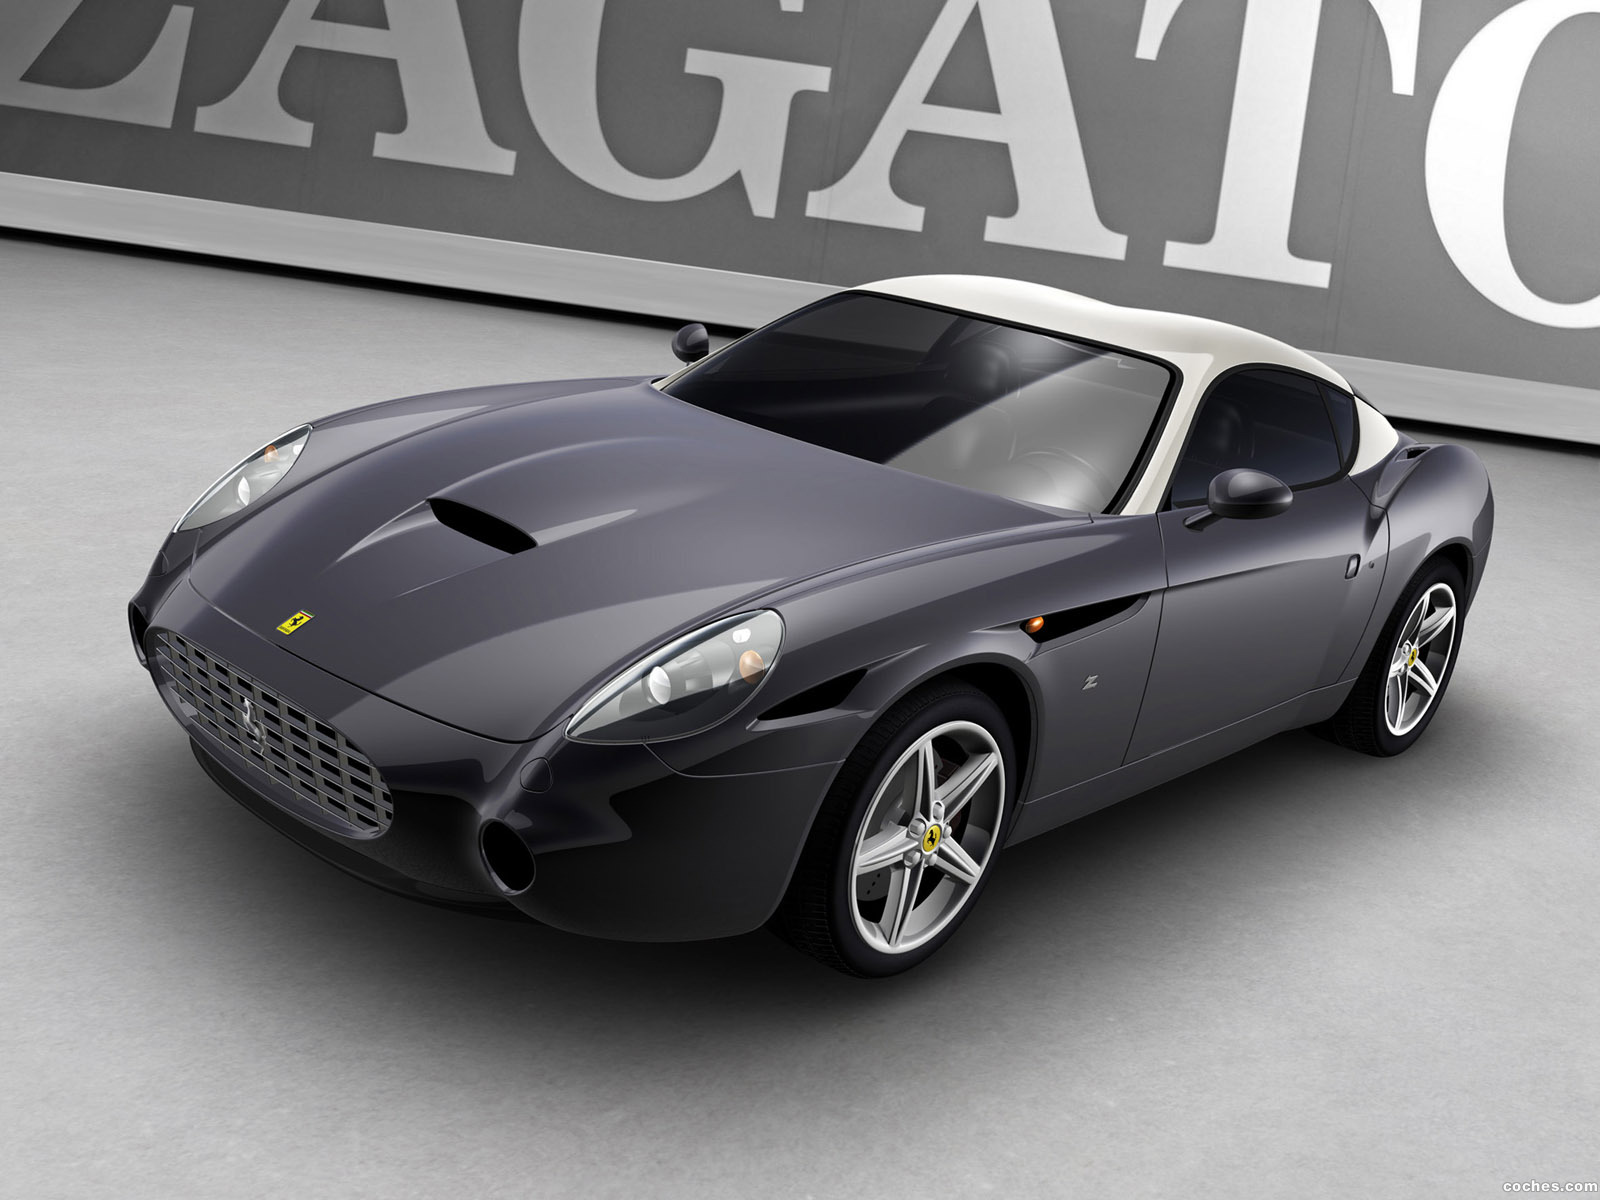 Foto 0 de Ferrari Zagato 575 GTZ 2006